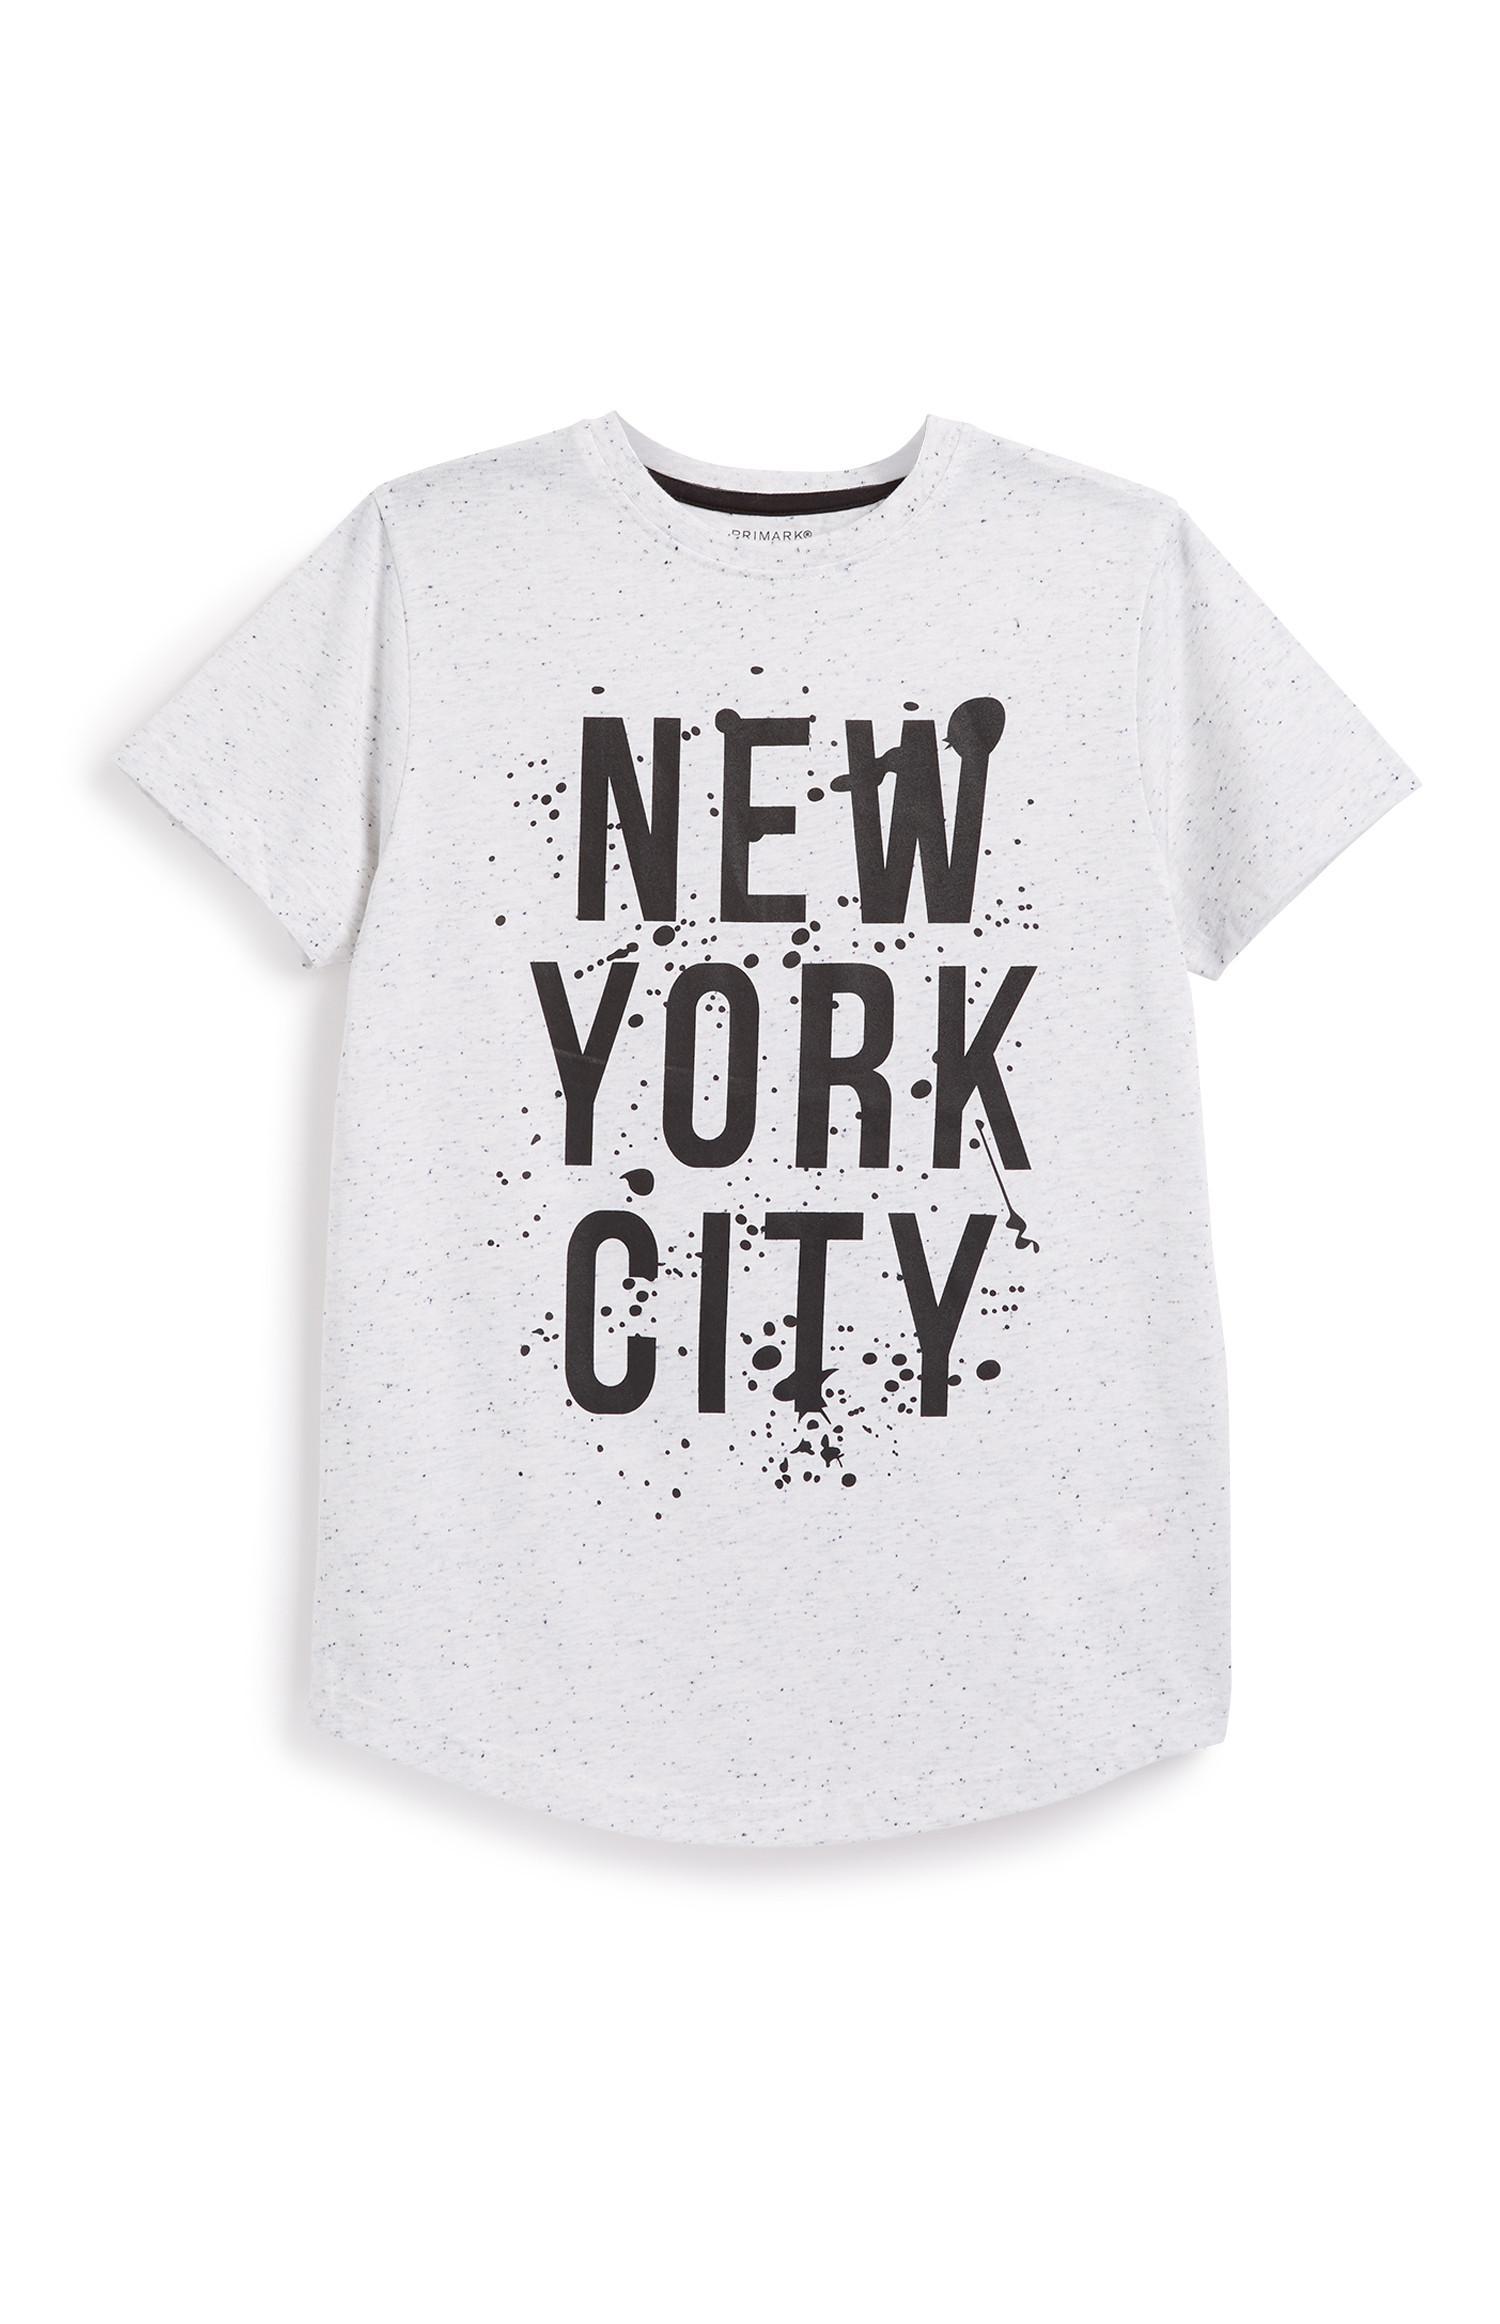 Older Boy New York City T-Shirt